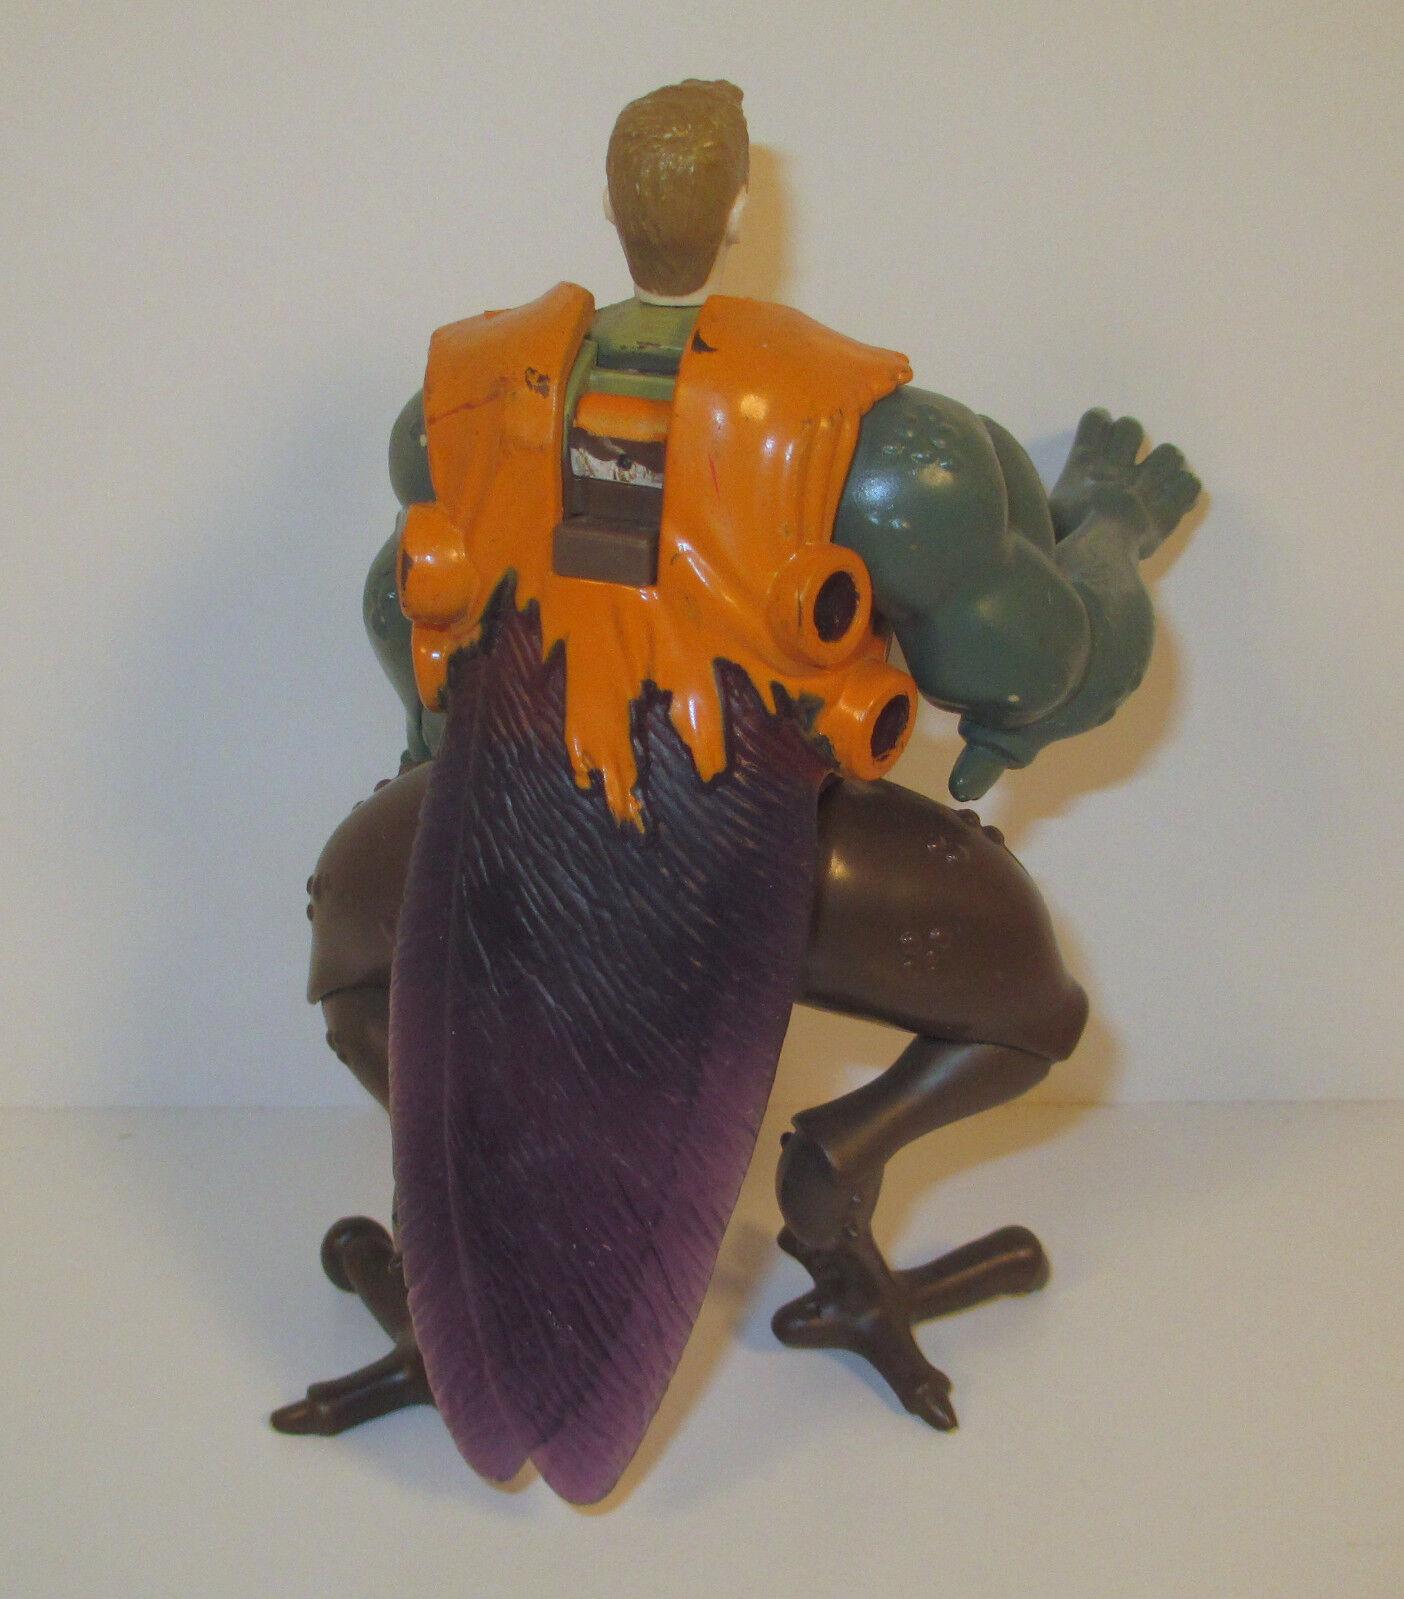 2005 Minnetonka the Bug Man 5.75  Action Action Action Figure Teenage Mutant Ninja Turtles e1dab7